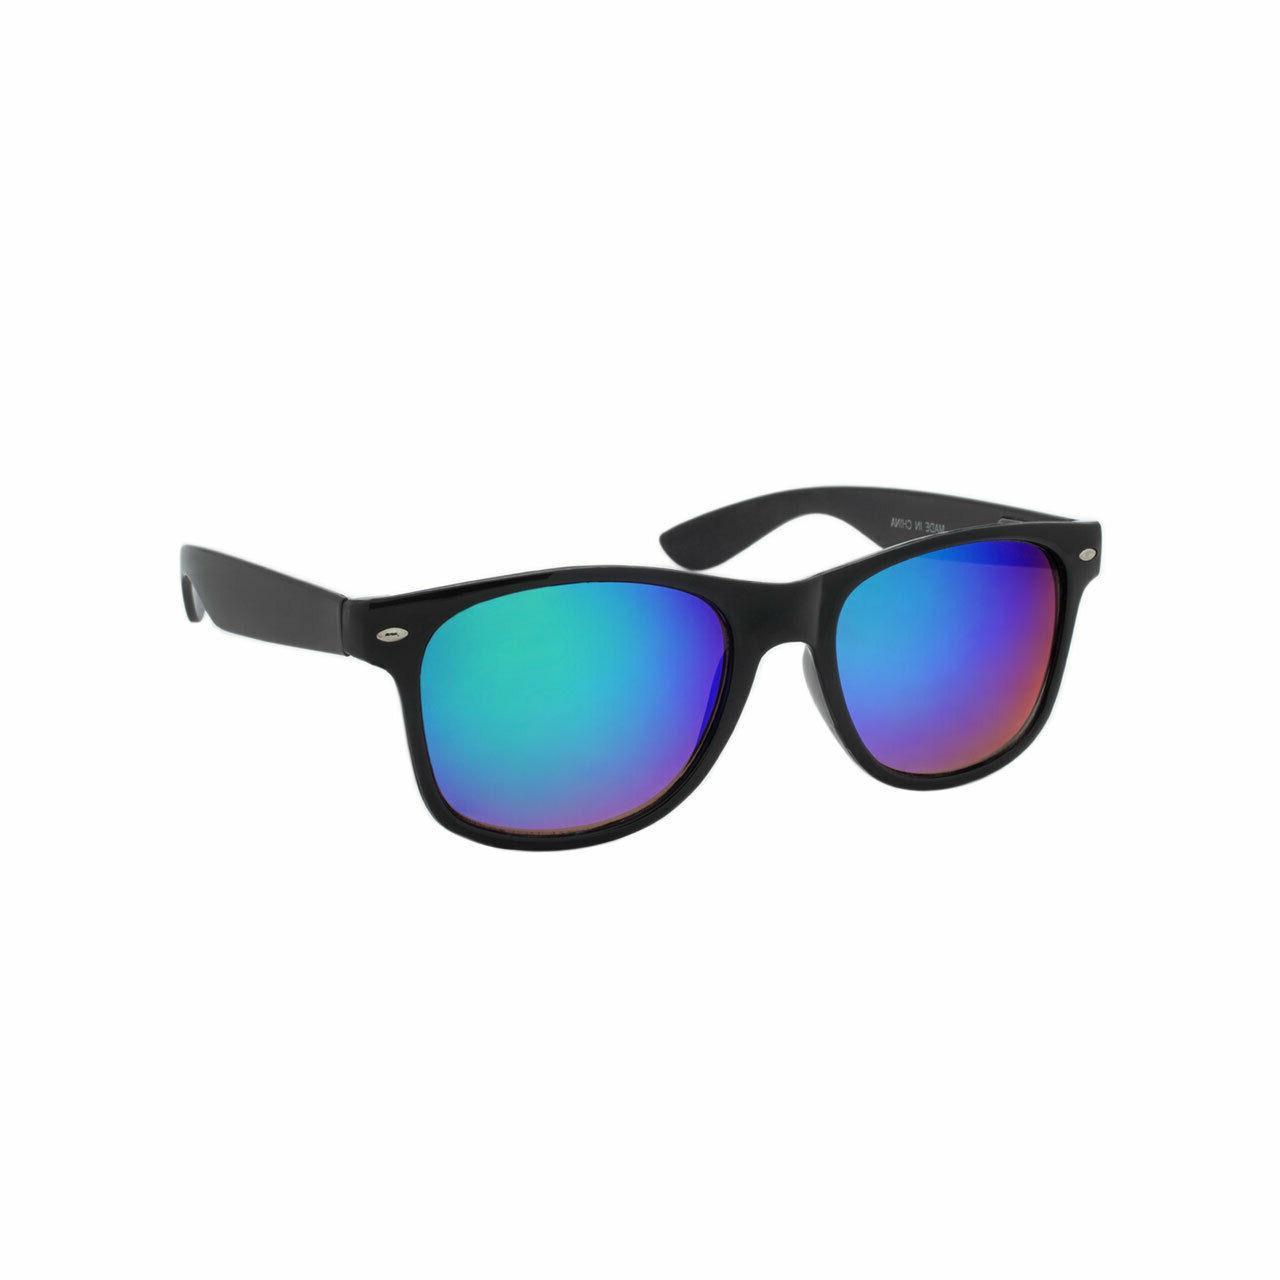 Bulk Sunglasses 36 PC Box Styles Unisex Styles